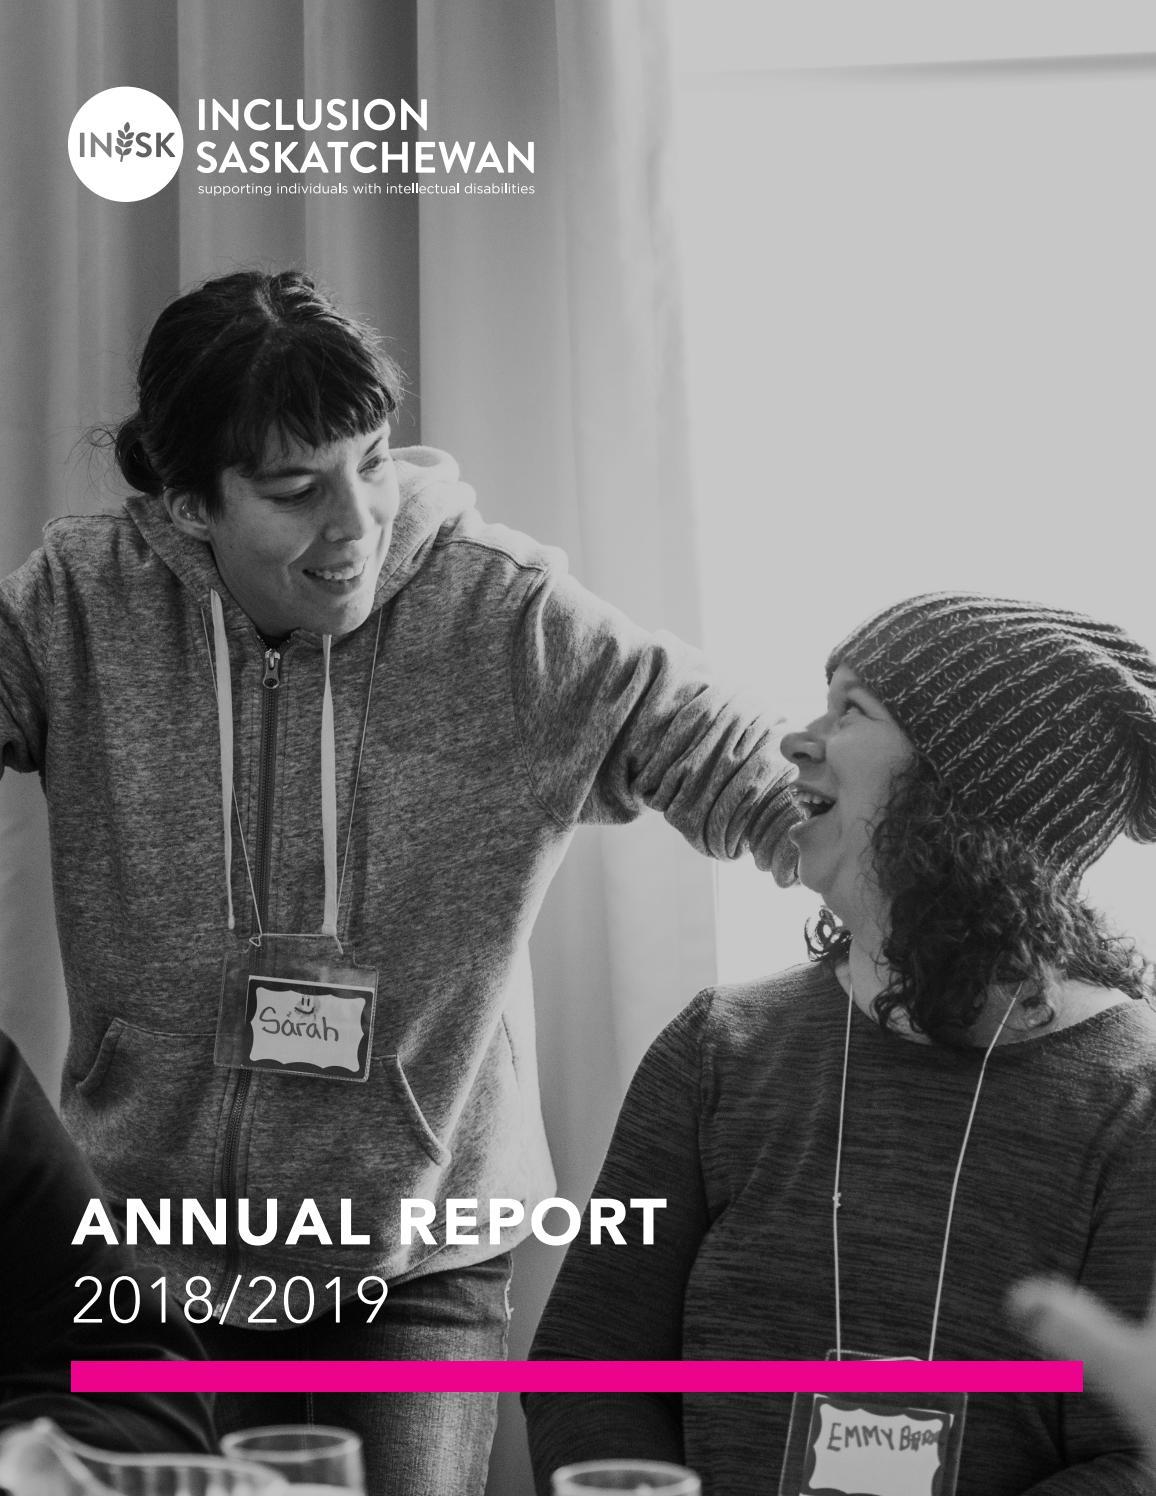 Annual Report 2018 2019 By The Saskatchewan Association For Community Living Issuu